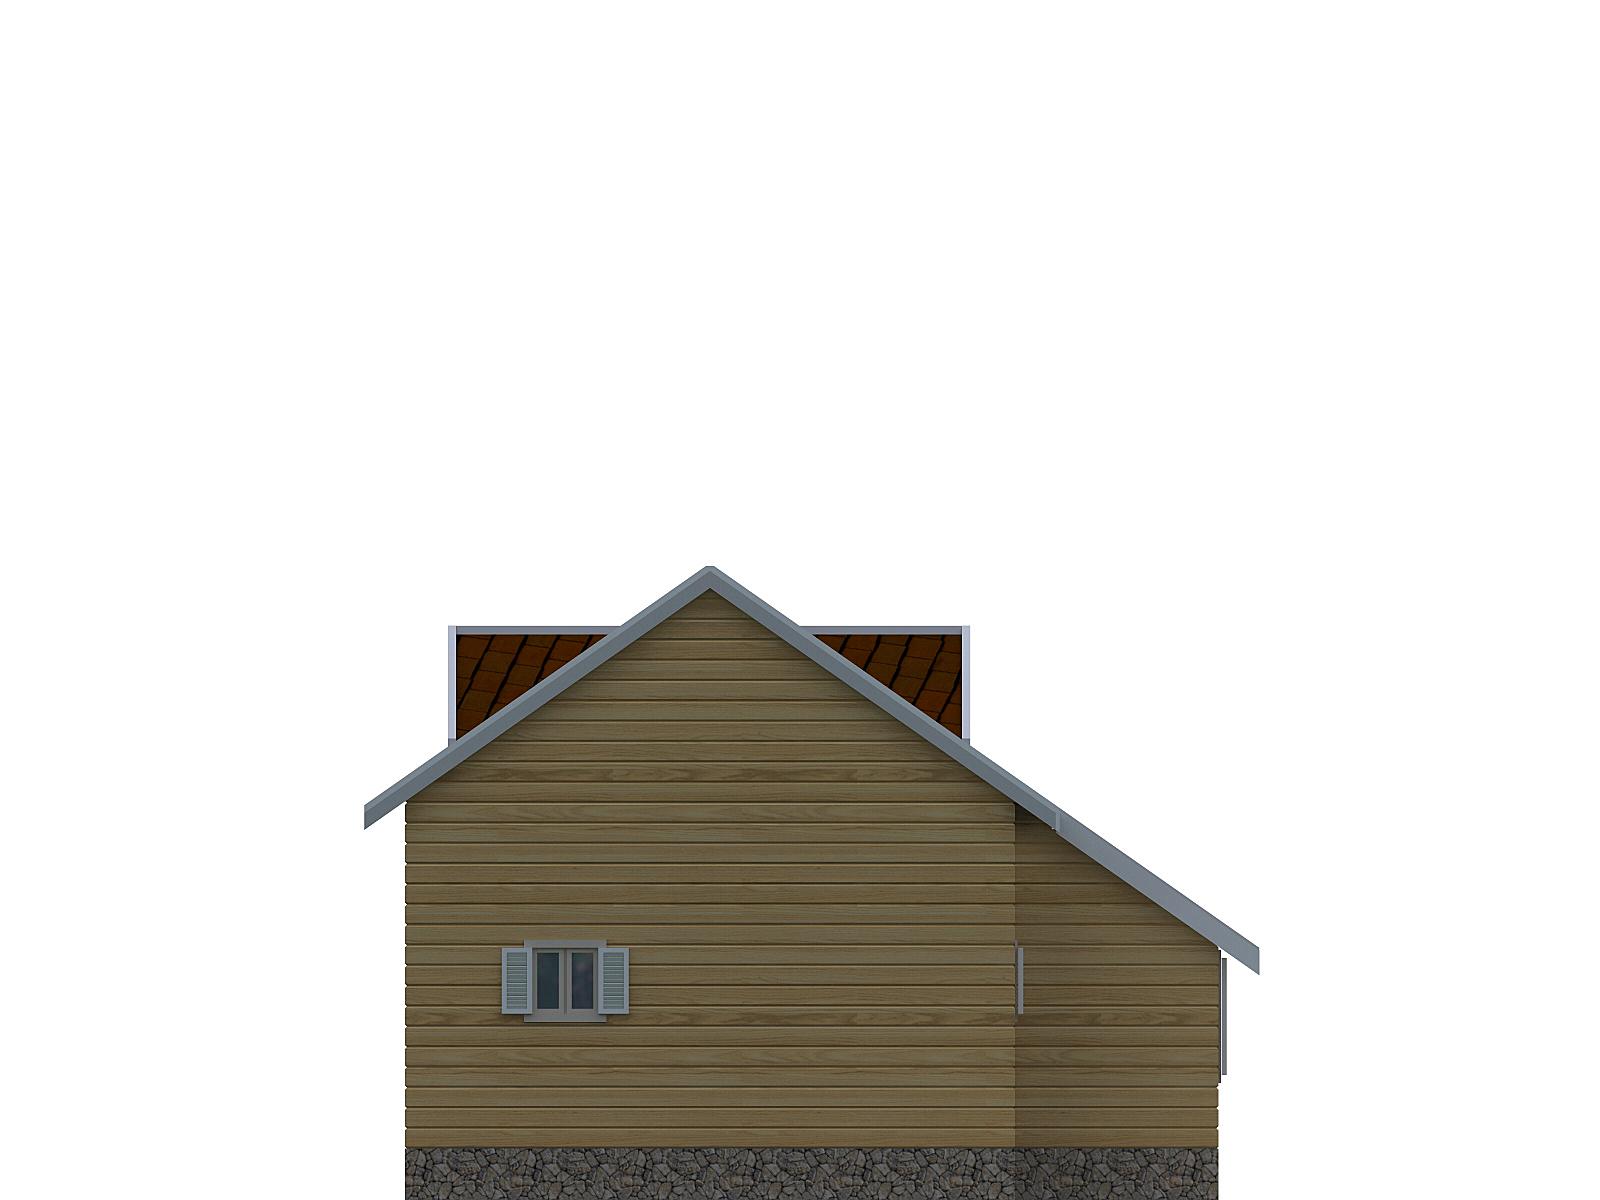 banya-iz-brusa-6x8-1.5-etazha-s-mansardoi-razrez2